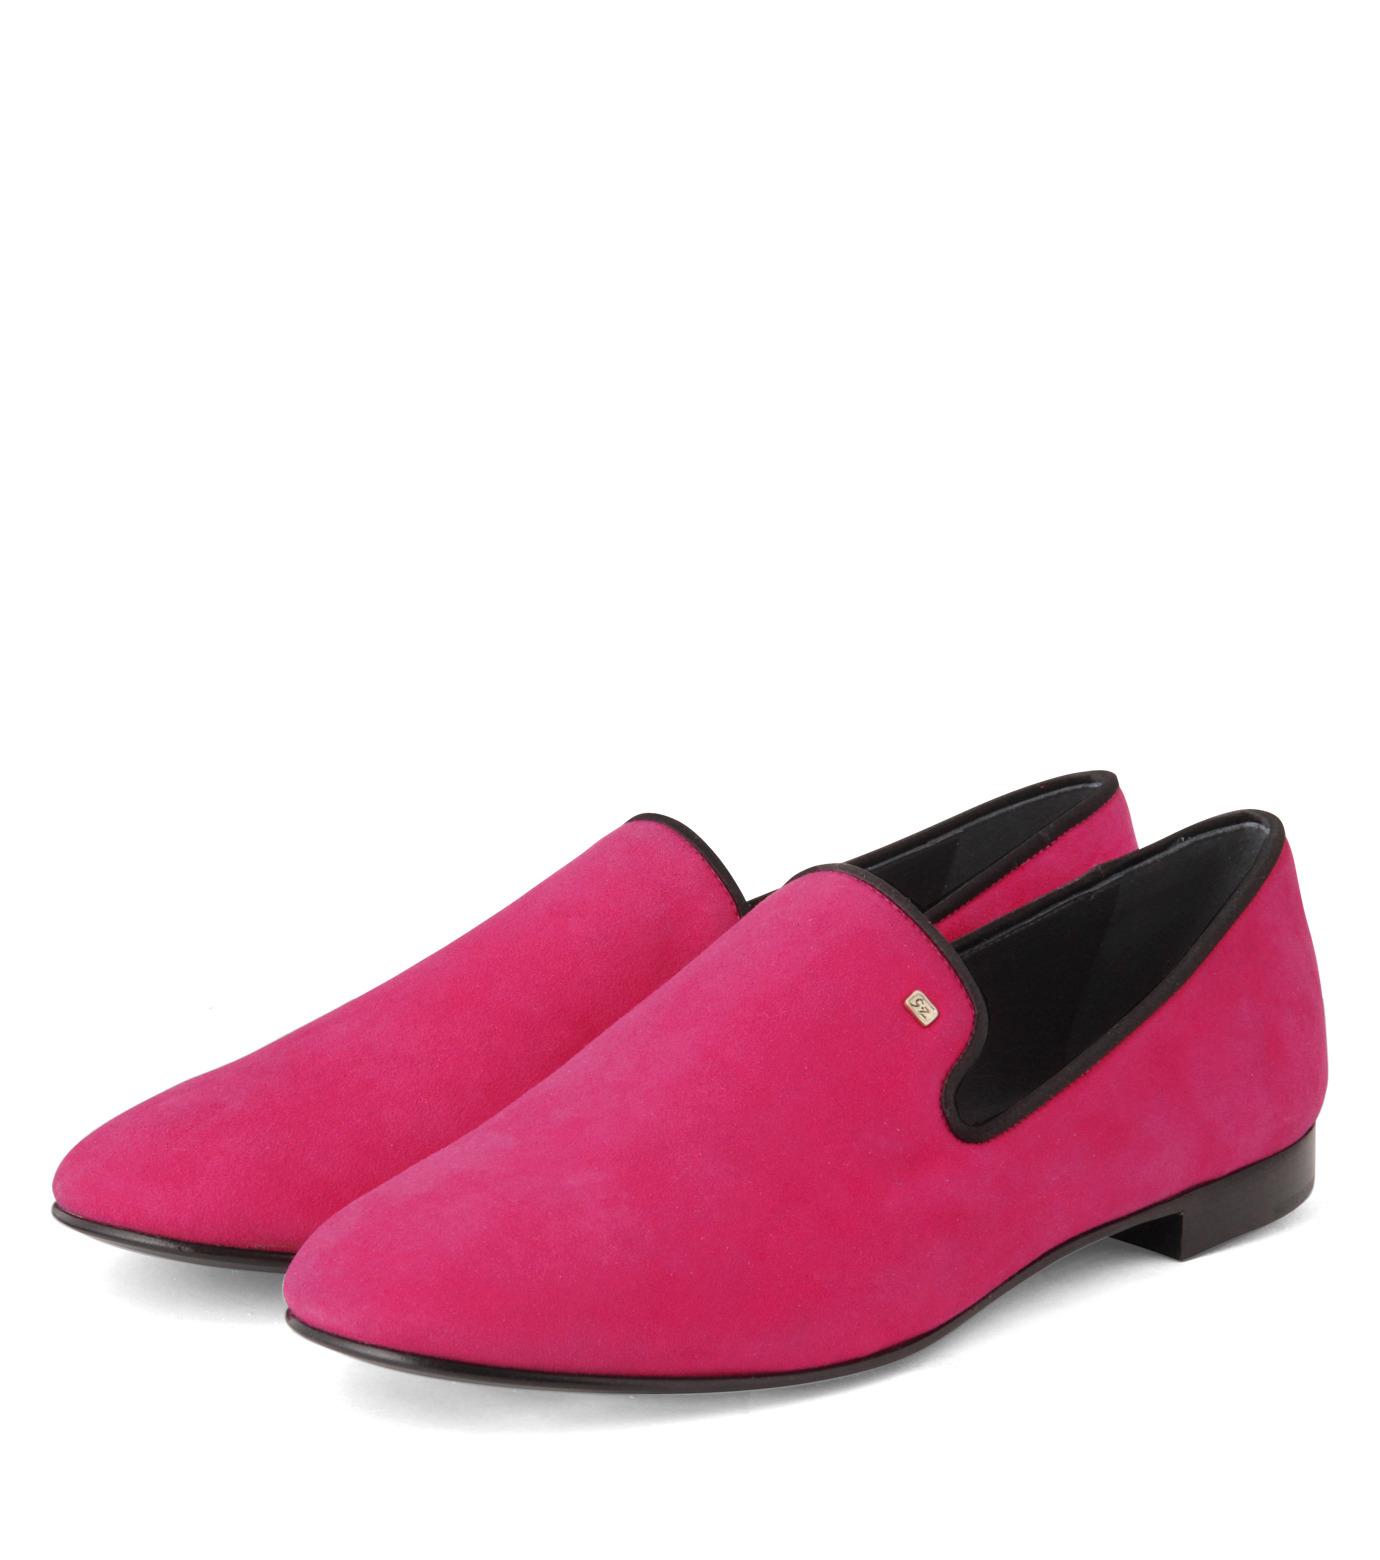 Giuseppe Zanotti Design(ジュゼッペザノッティ)のSuede Slipon-PINK(シューズ/shoes)-EU4010-CA5-72 拡大詳細画像4